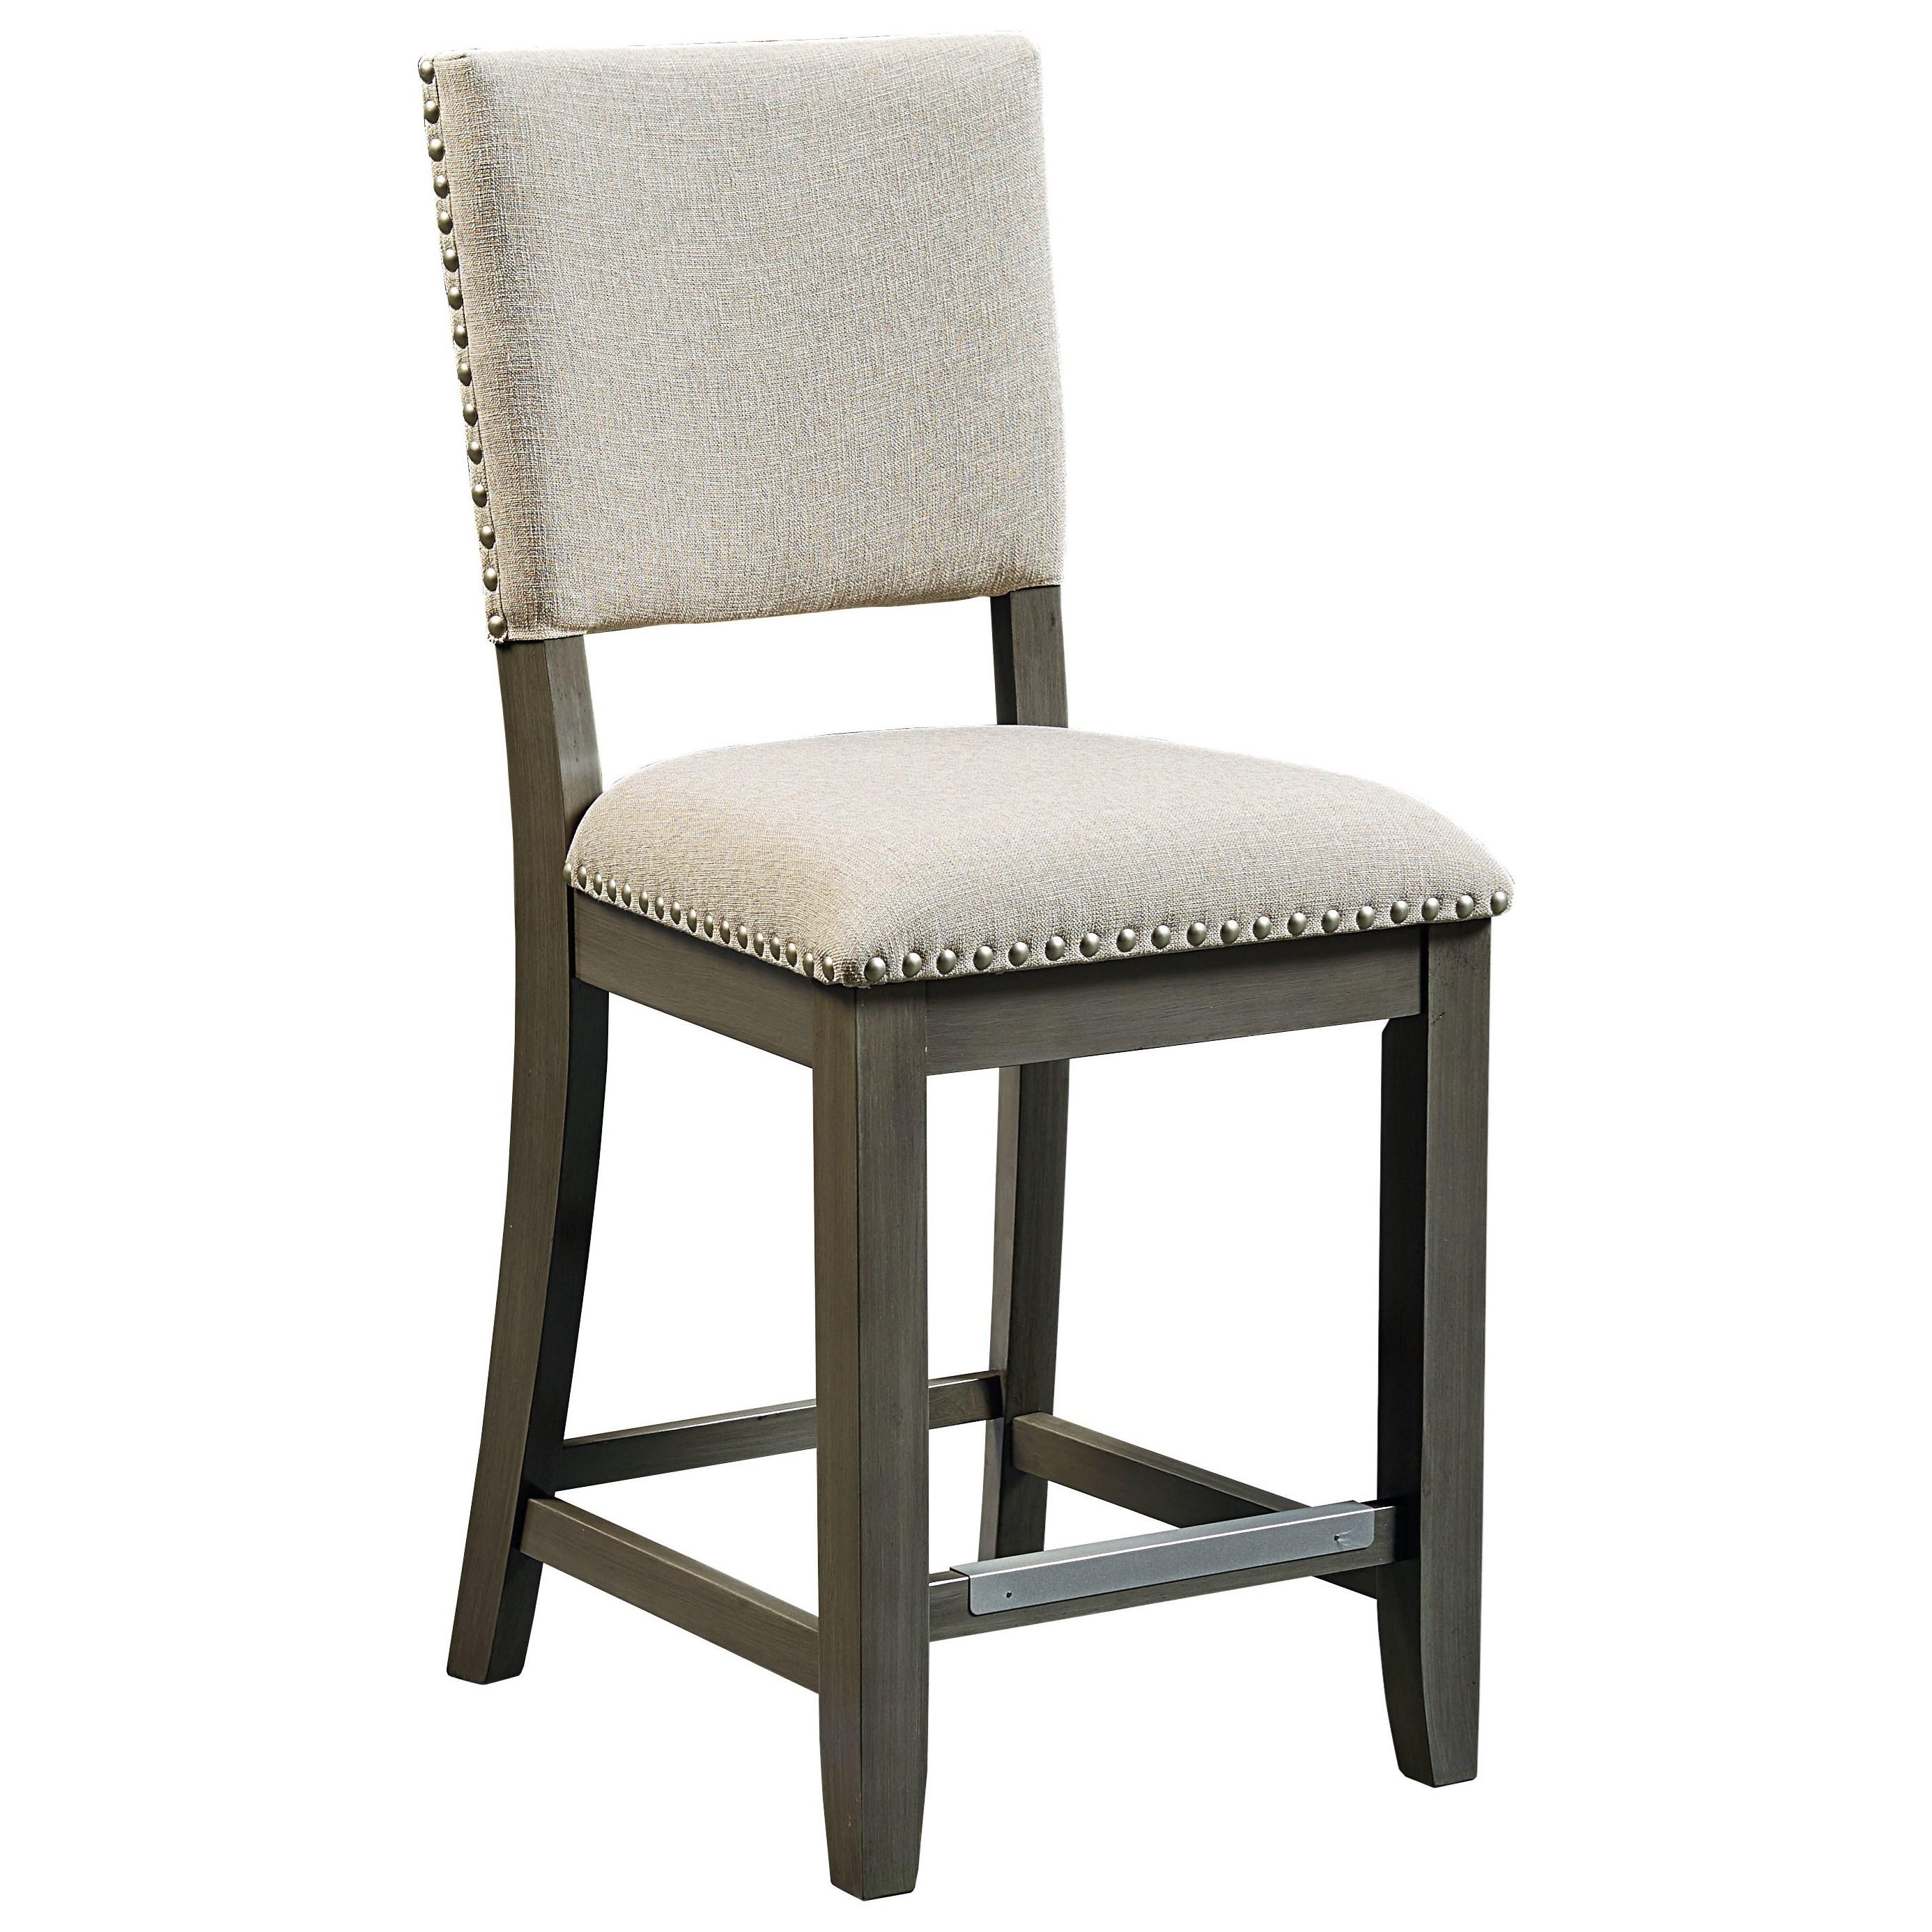 bar stool chair grey ergonomic jakarta standard furniture omaha counter height